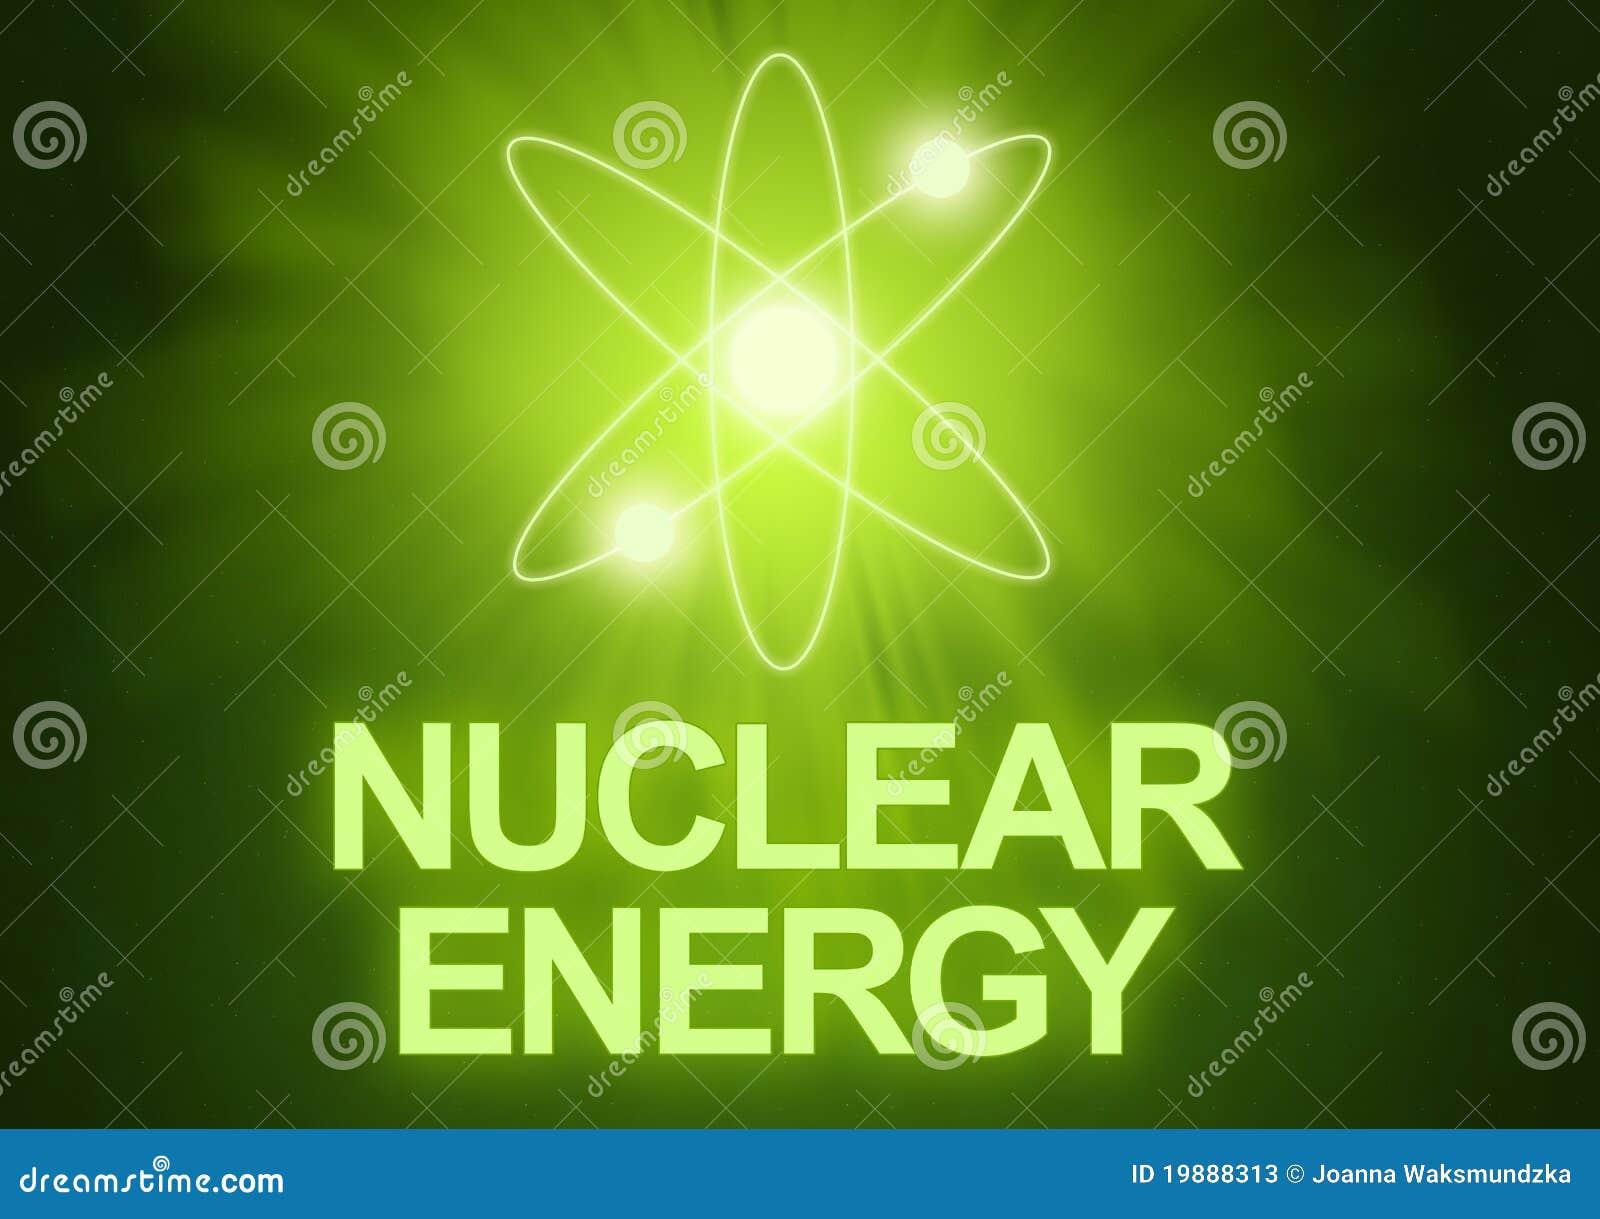 download bombay islam the religious economy of the